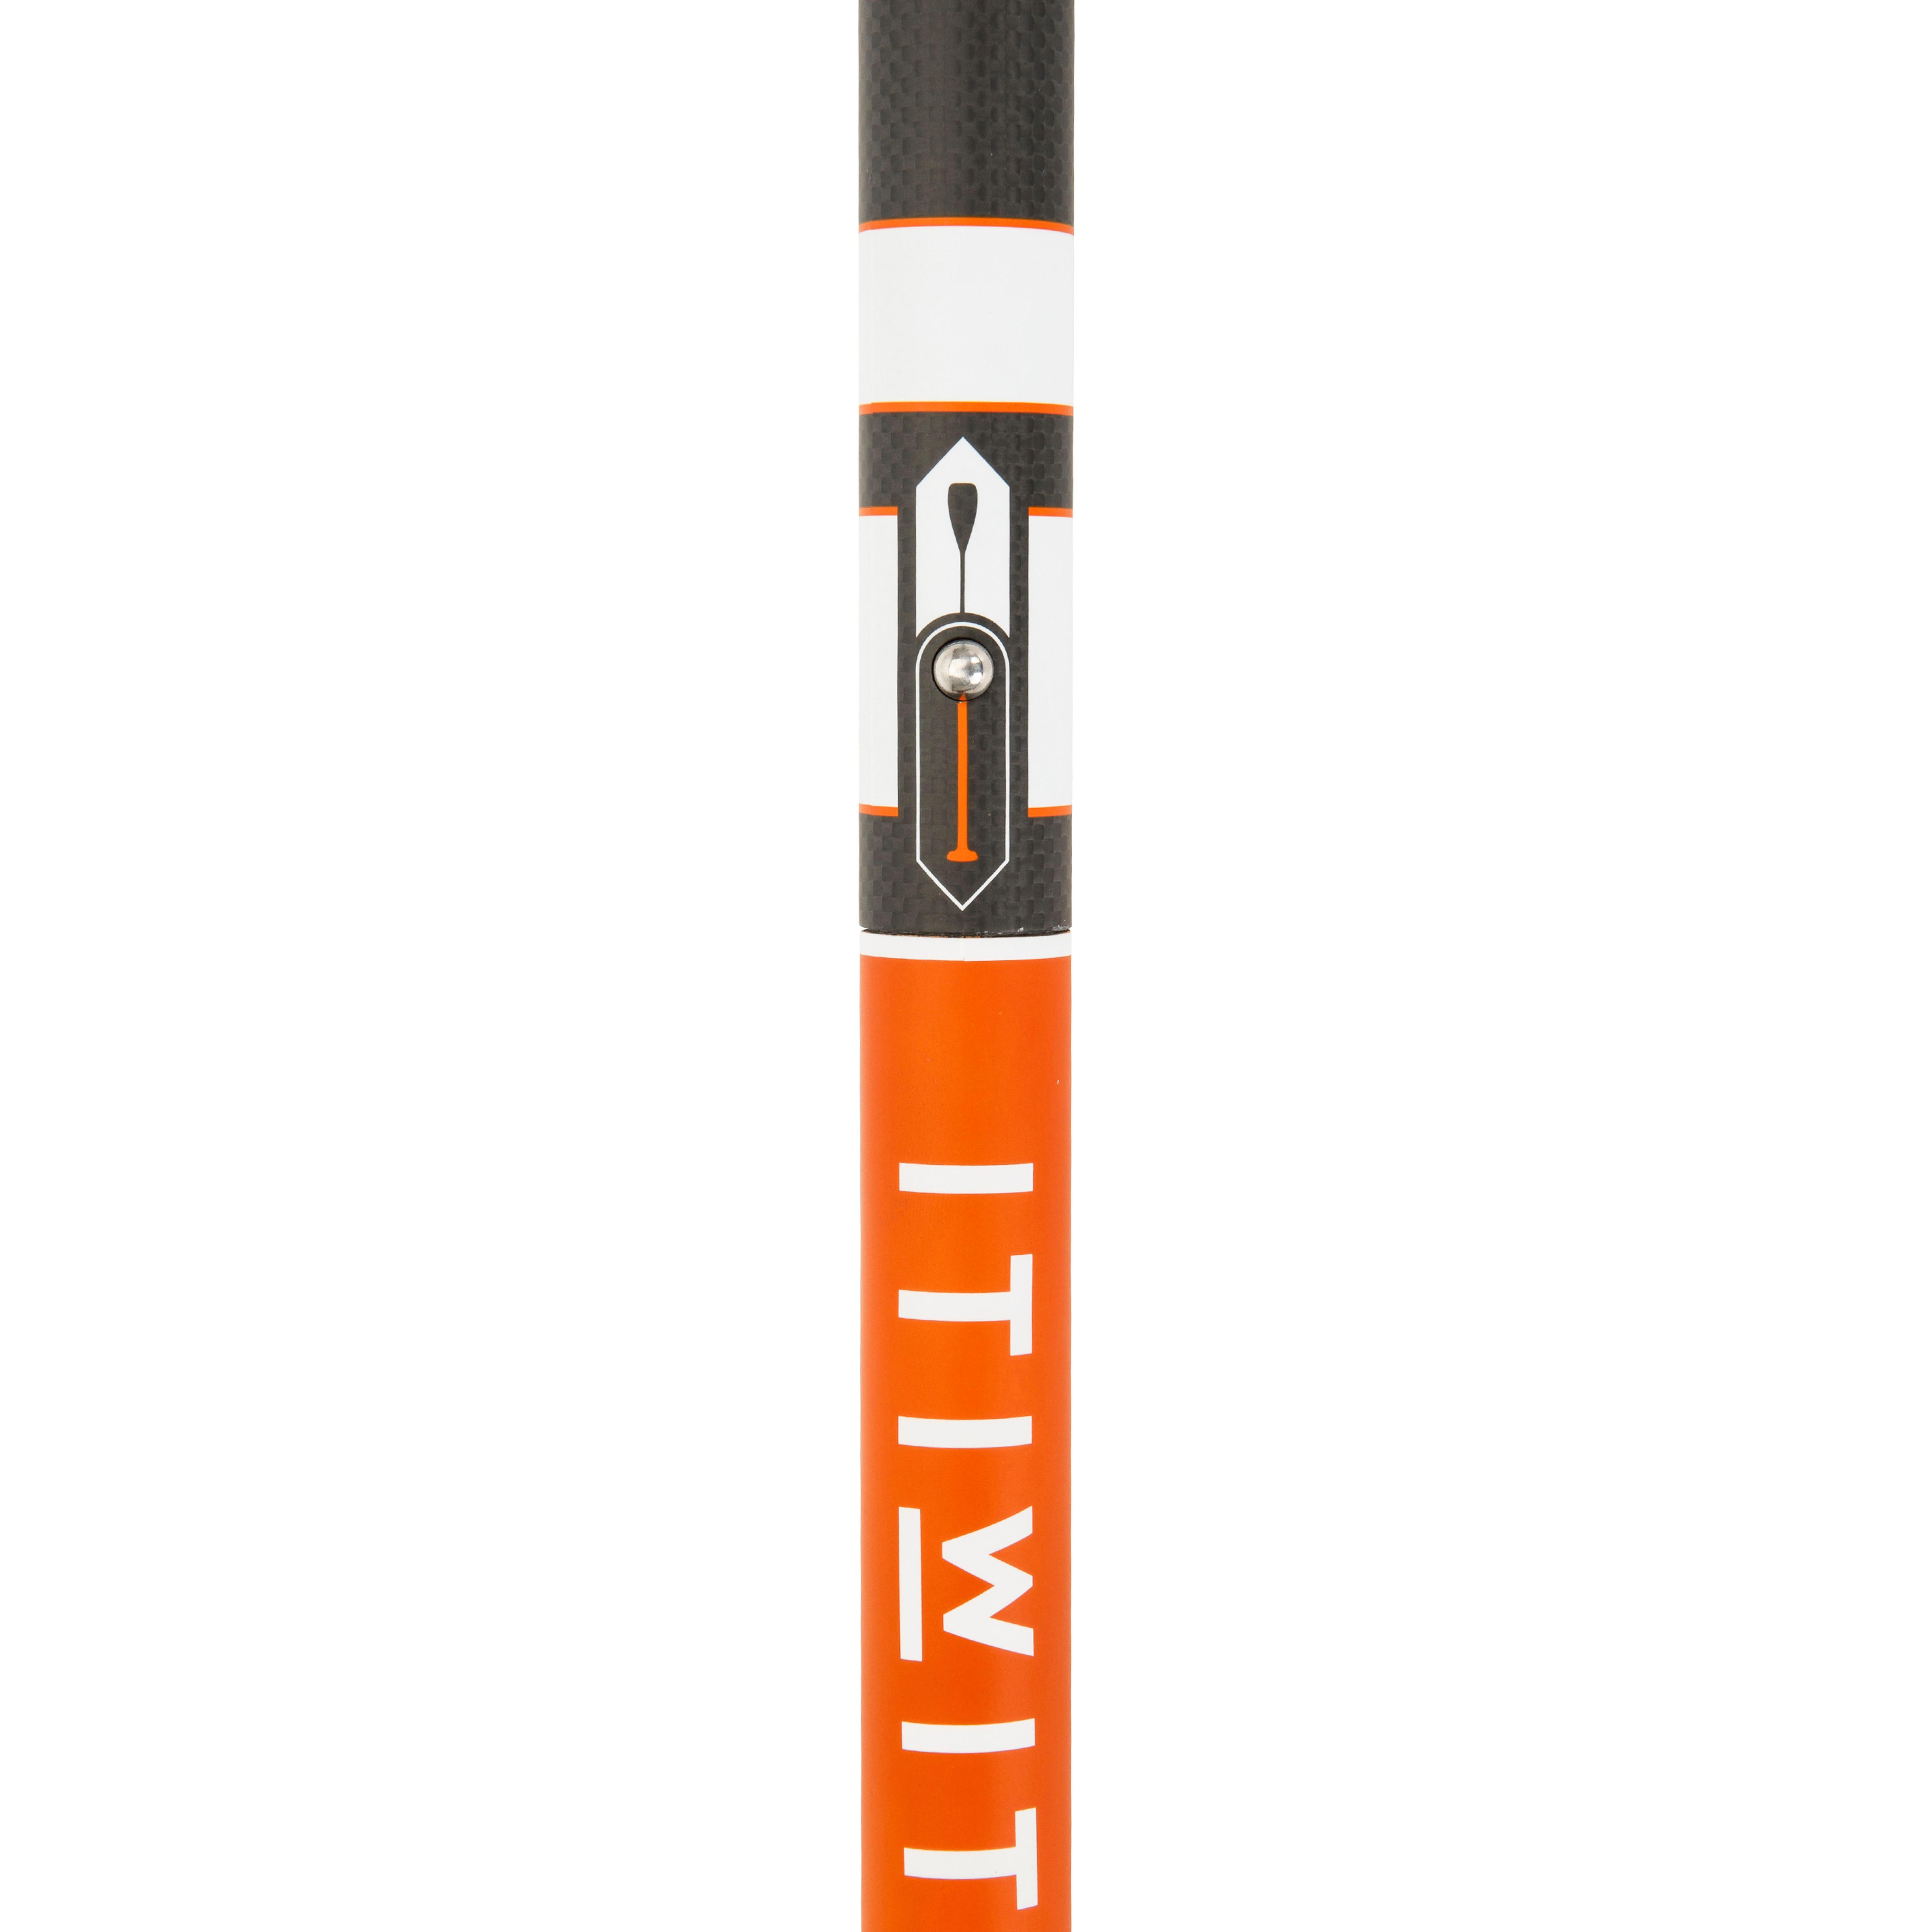 PAGAIE STAND UP PADDLE 500 TUBE CARBONE DÉMONTABLE RÉGLABLE 170-210 CM